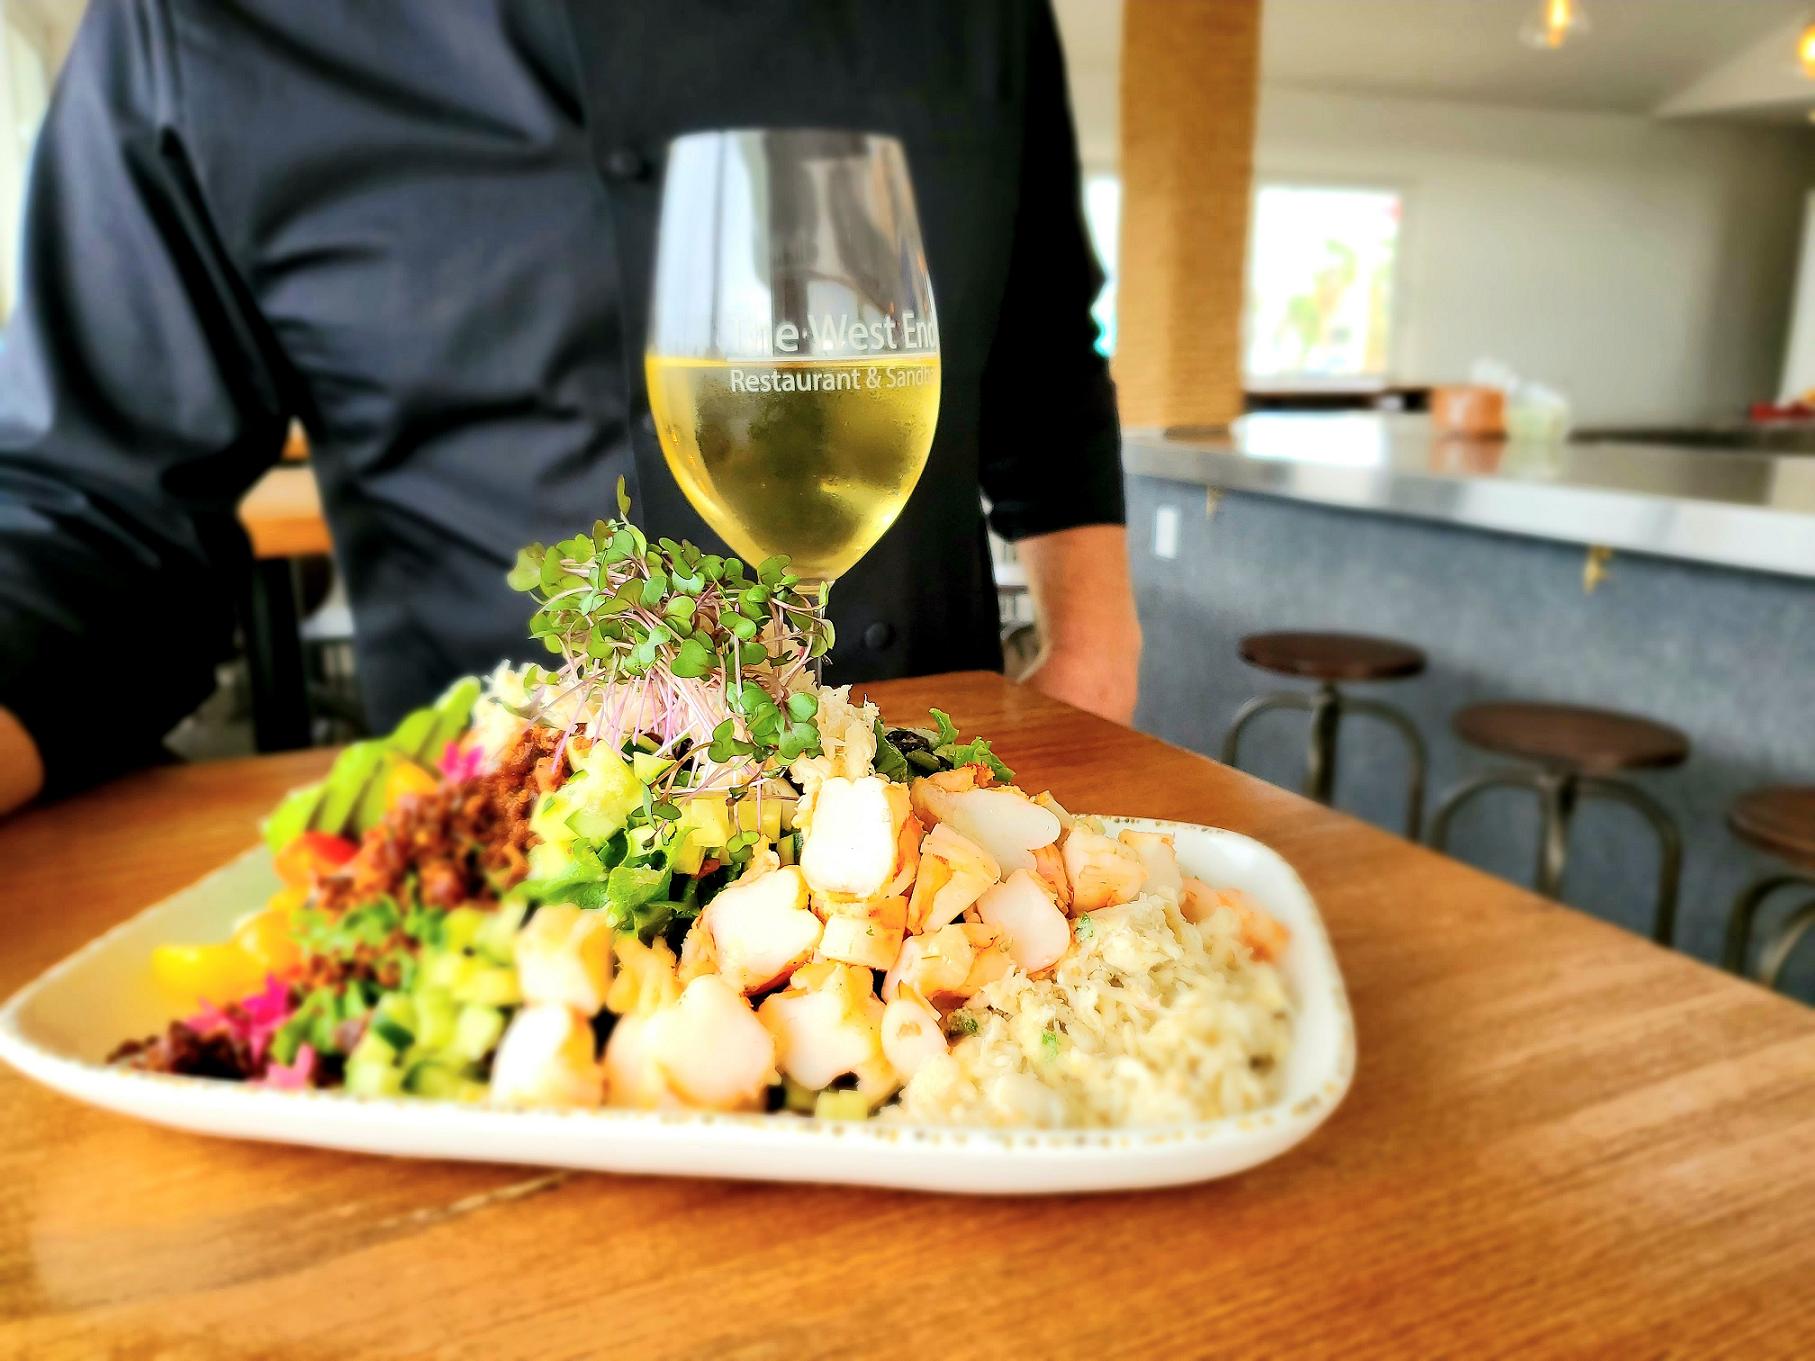 chef aldis west end marina and restaurants cobb salad and chardonnay